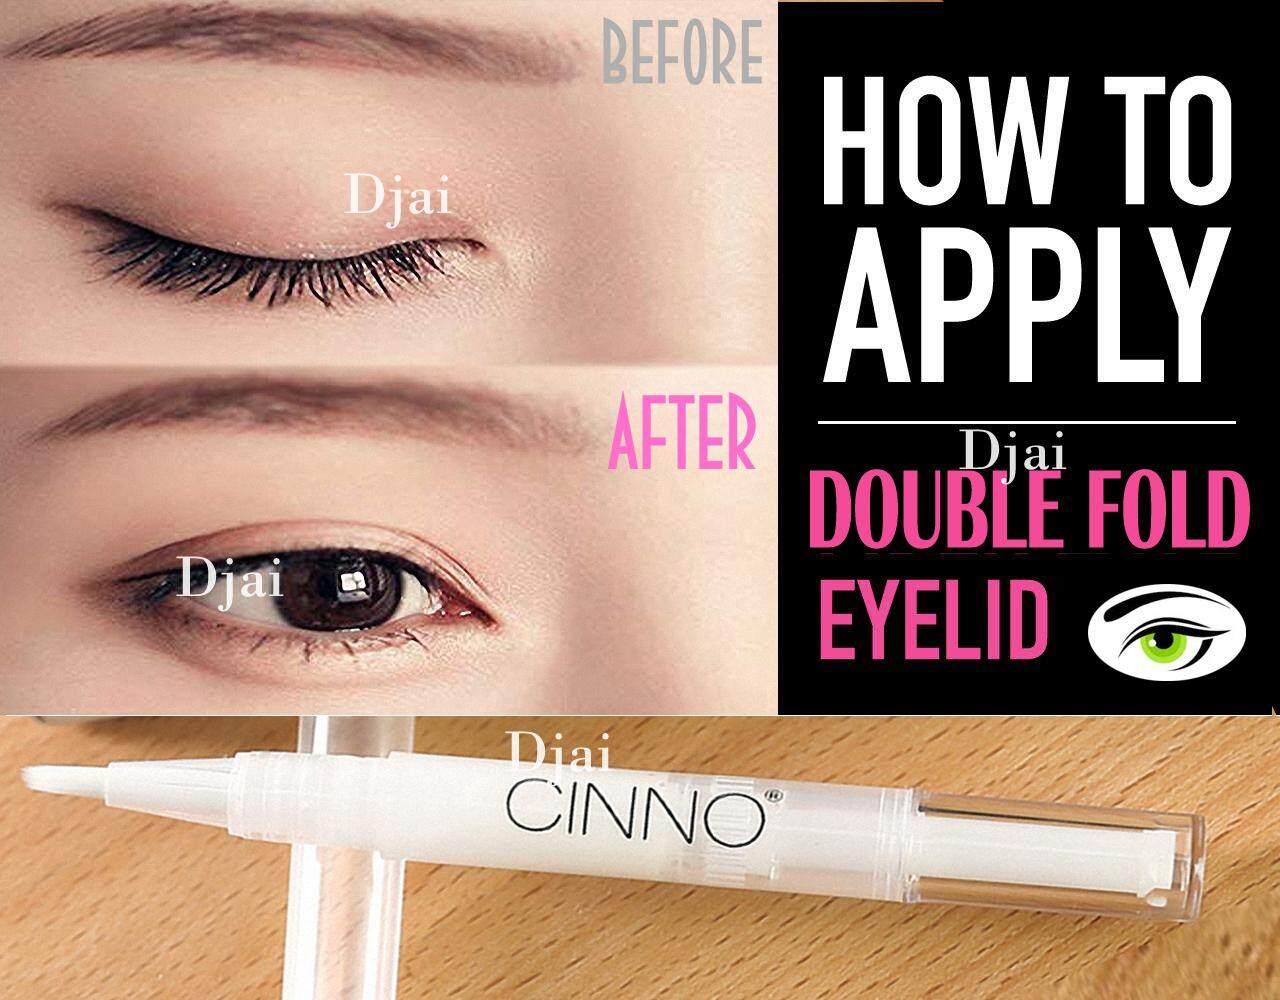 Djai ครีมเจล บิวตี้ ครีมบิ๊กอาย เปลือกตาสองชั้น ตาสองชั้น สวย ธรรมชาติ CINNO Double Eyelid Styling Cream Gel Beauty Big Eyes Cream